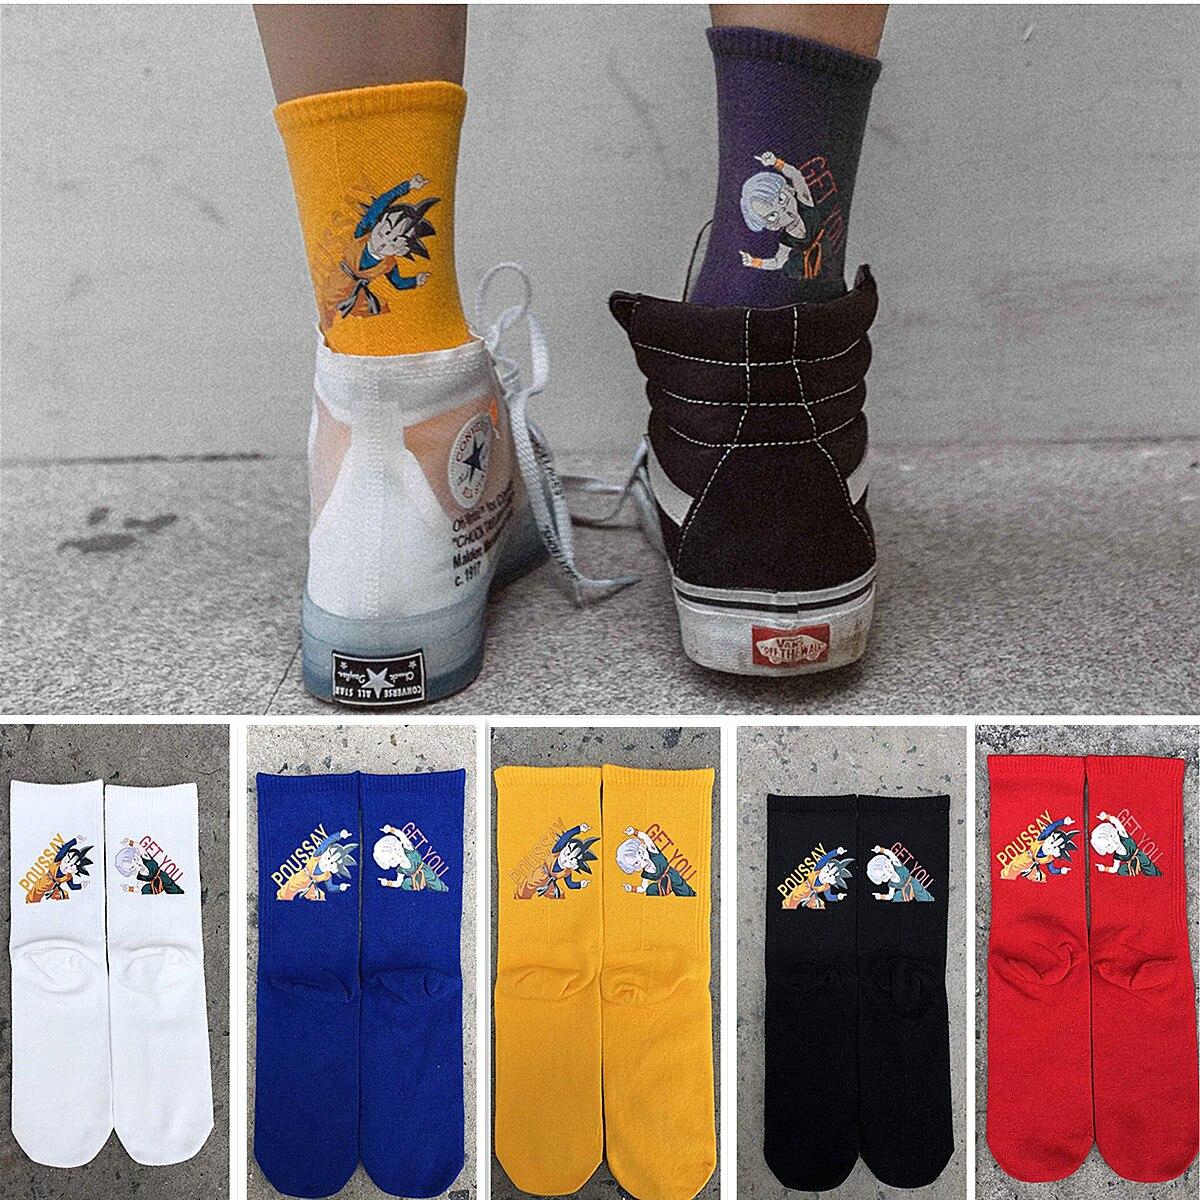 Funny dragon ball cartoon anime street fashion long   socks   unisex happy hip hop skateboard   socks   fashion personality cool   socks